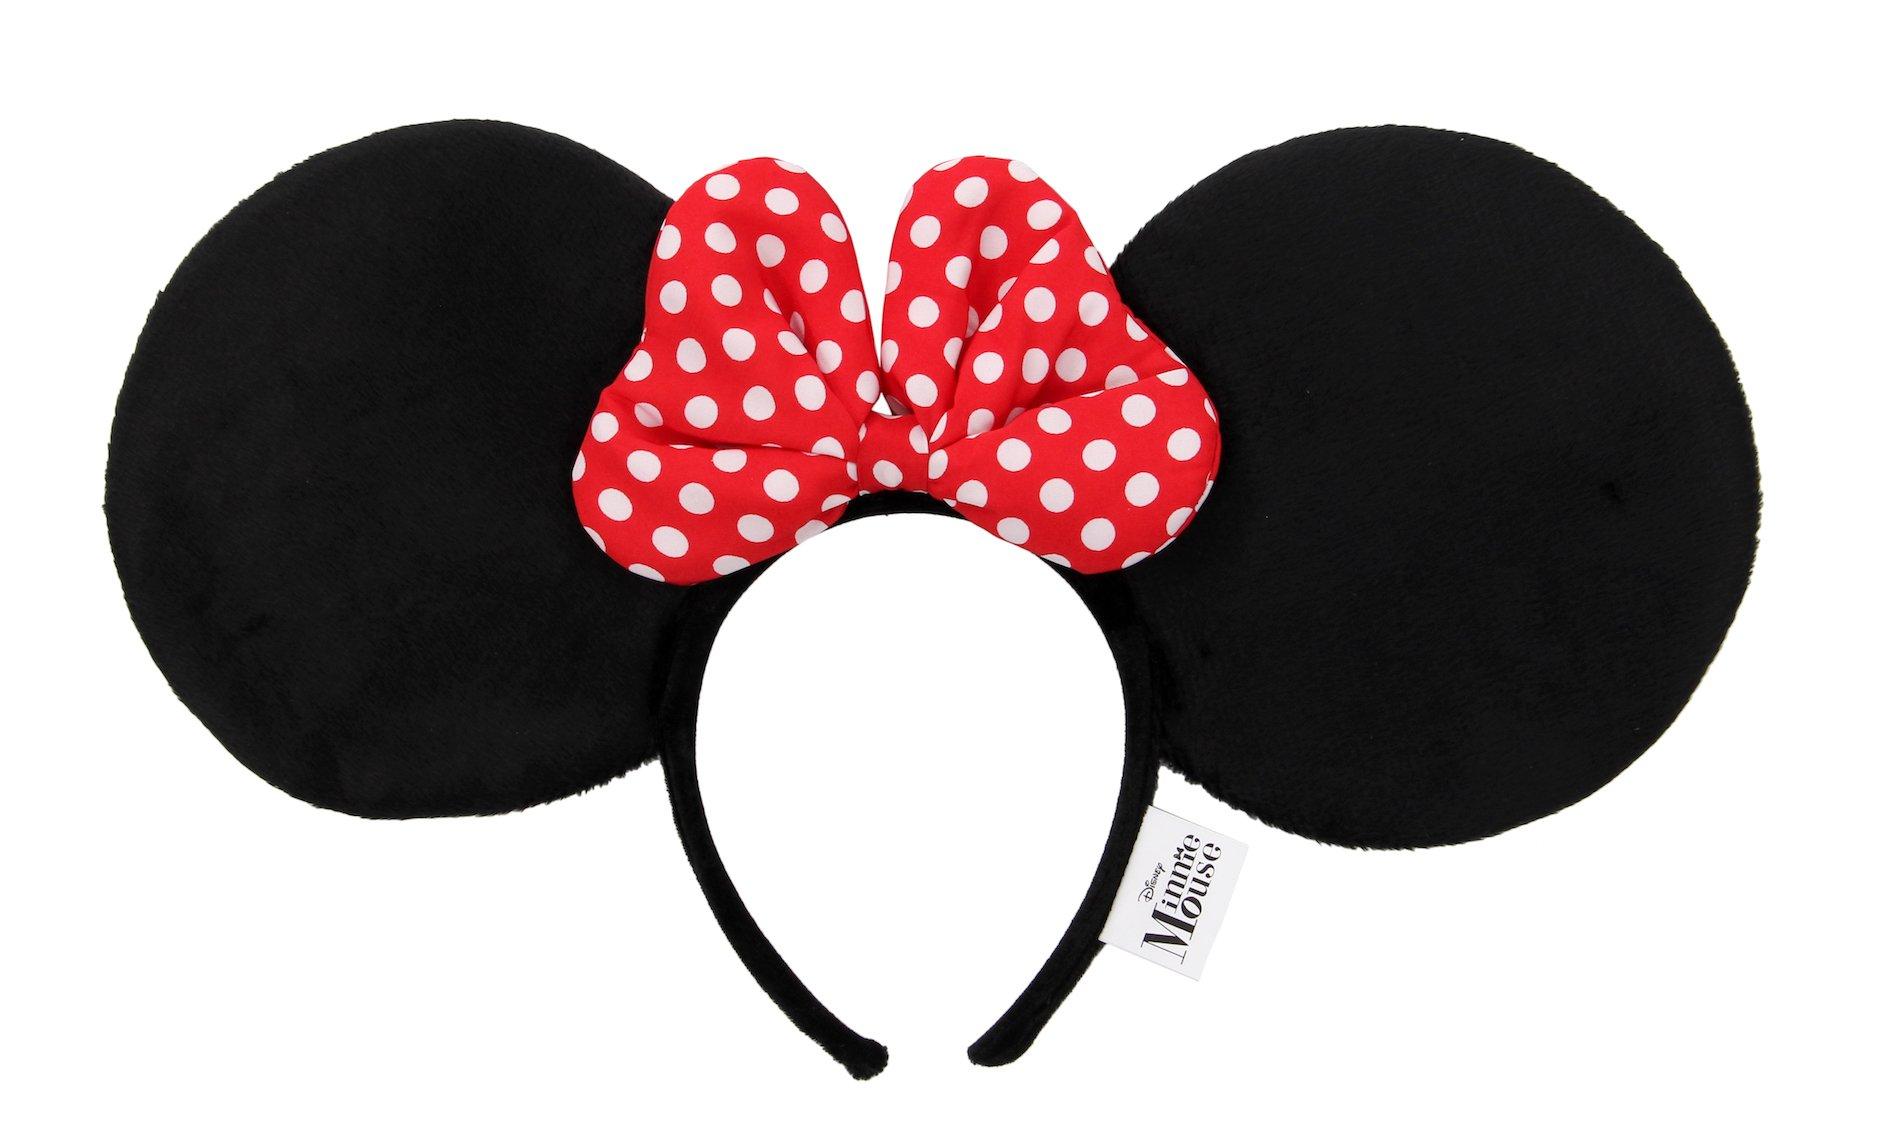 Disney Oversized Minnie Ears Headband by elope